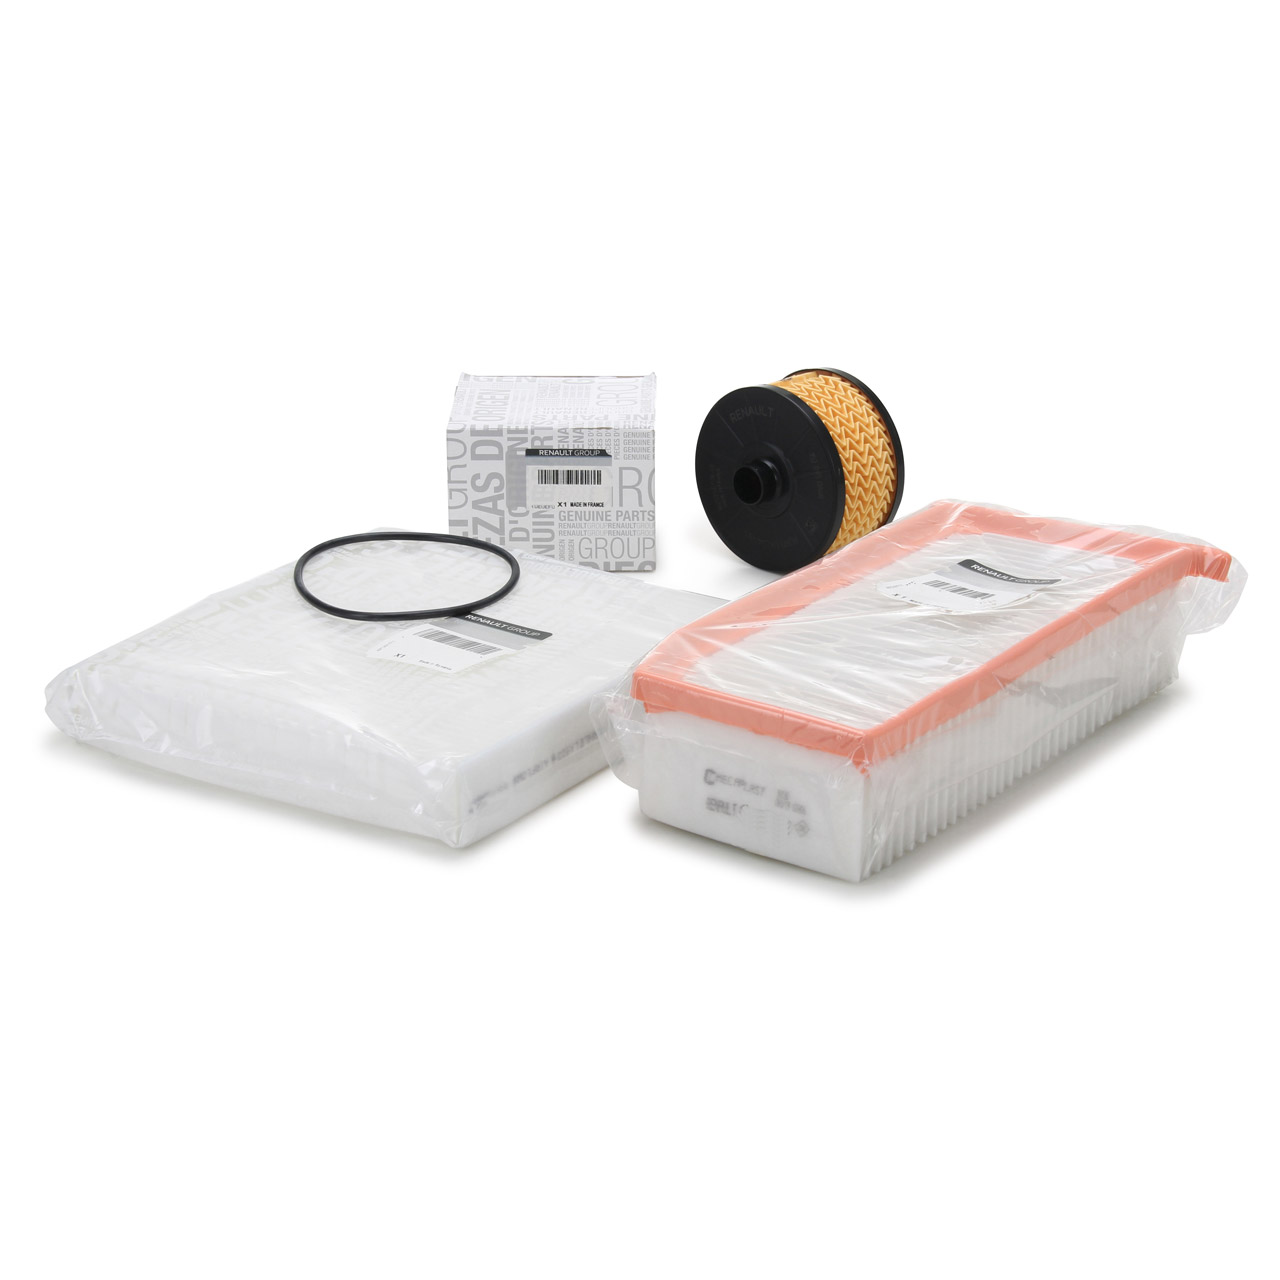 ORIGINAL Renault Inspektionskit Filterpaket Clio IV (BH KH) 0.9/1.2TCe 90/120 PS